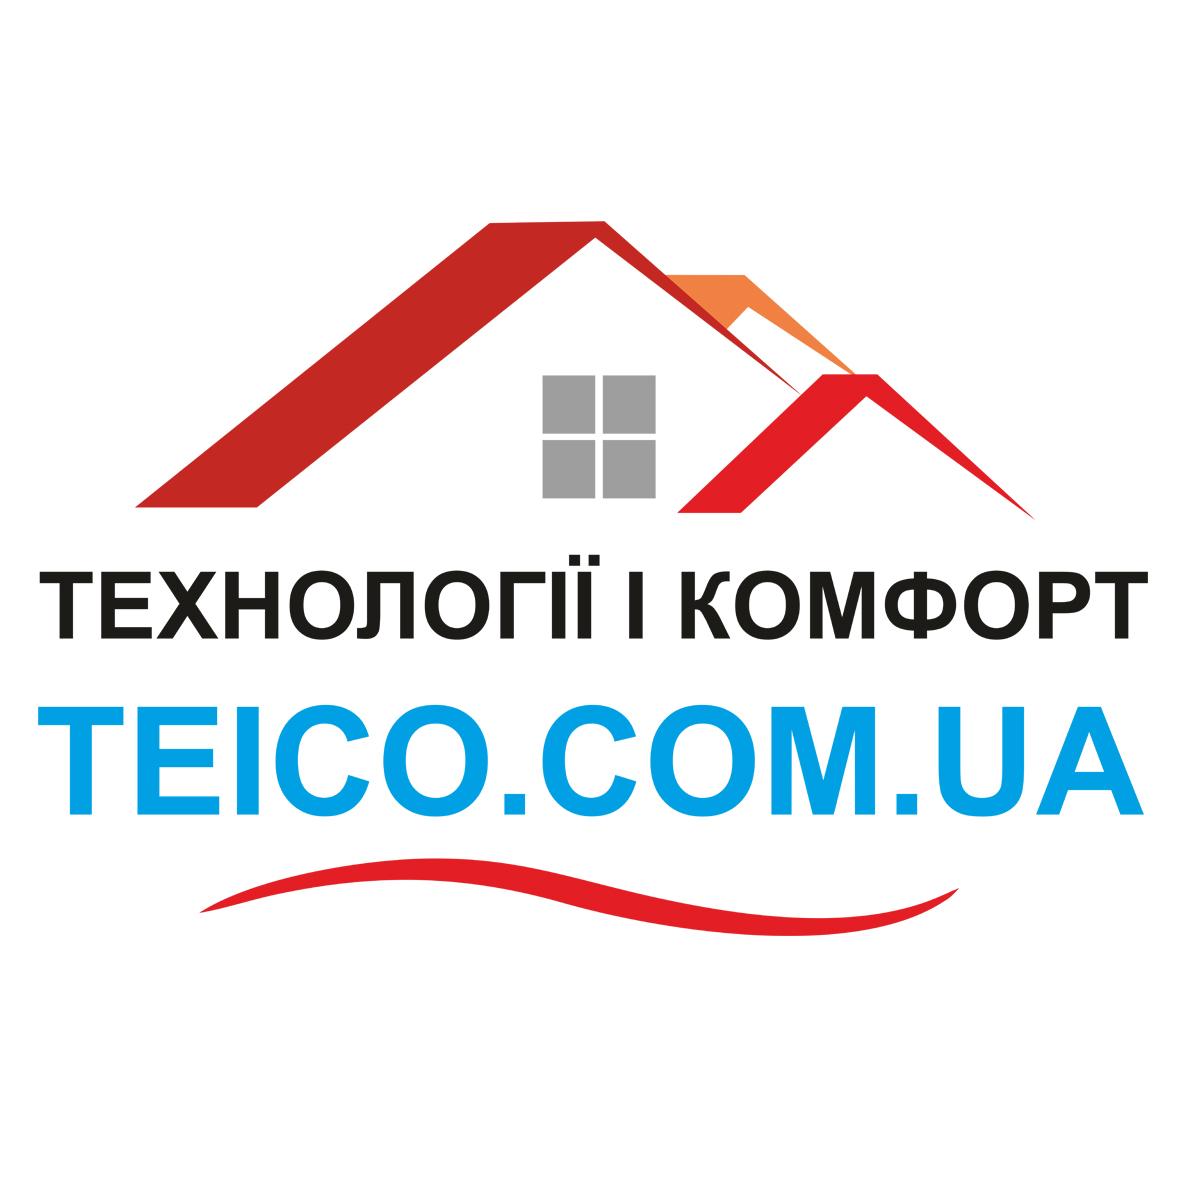 TeiCo (Технологии и Комфорт)